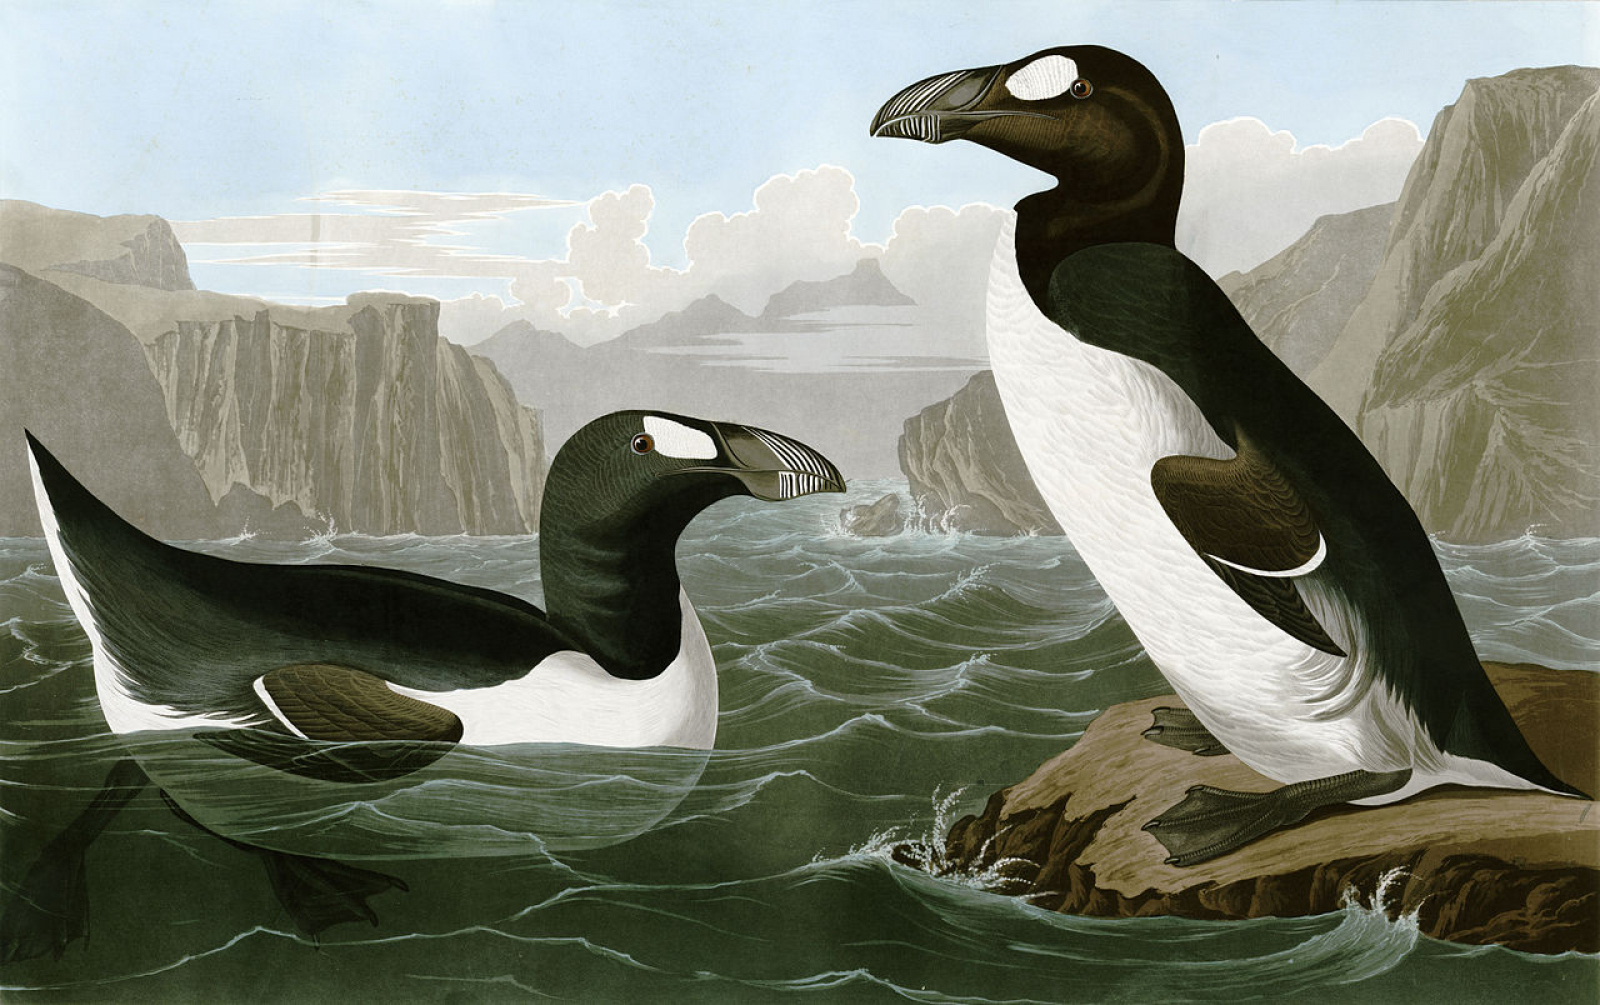 Pingüins boreals dibuixats per John James Audubon a 'The Birds of America' (1827–1838)